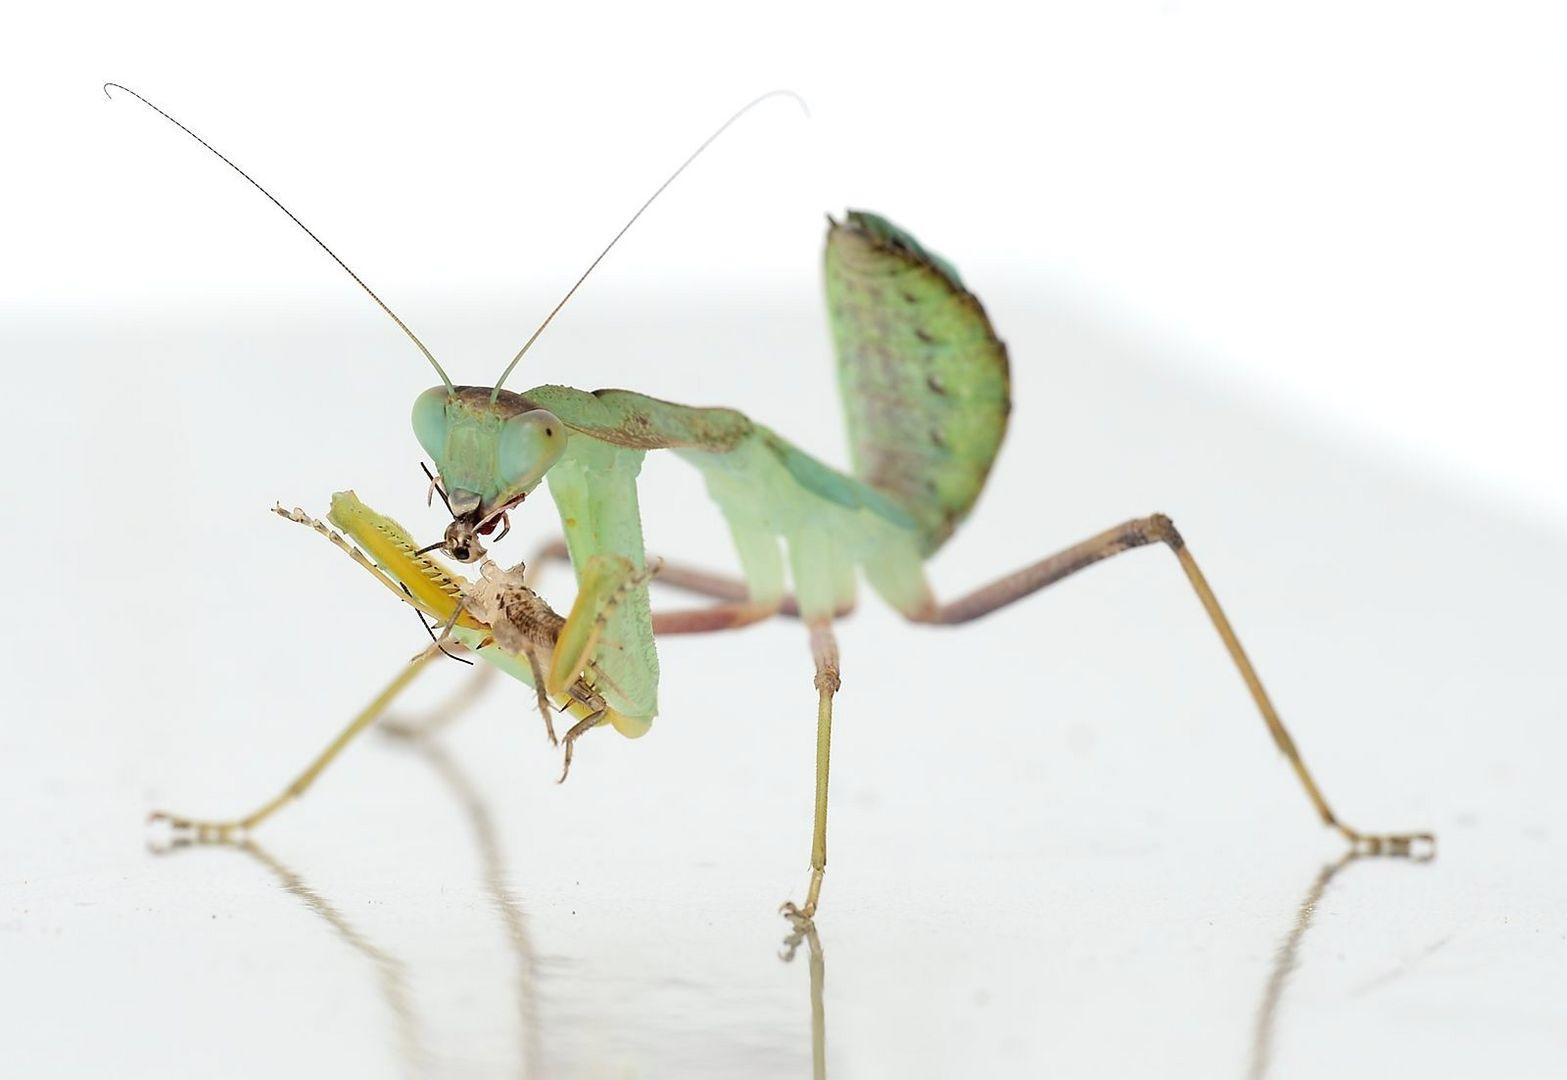 Mantis eating a Cricket